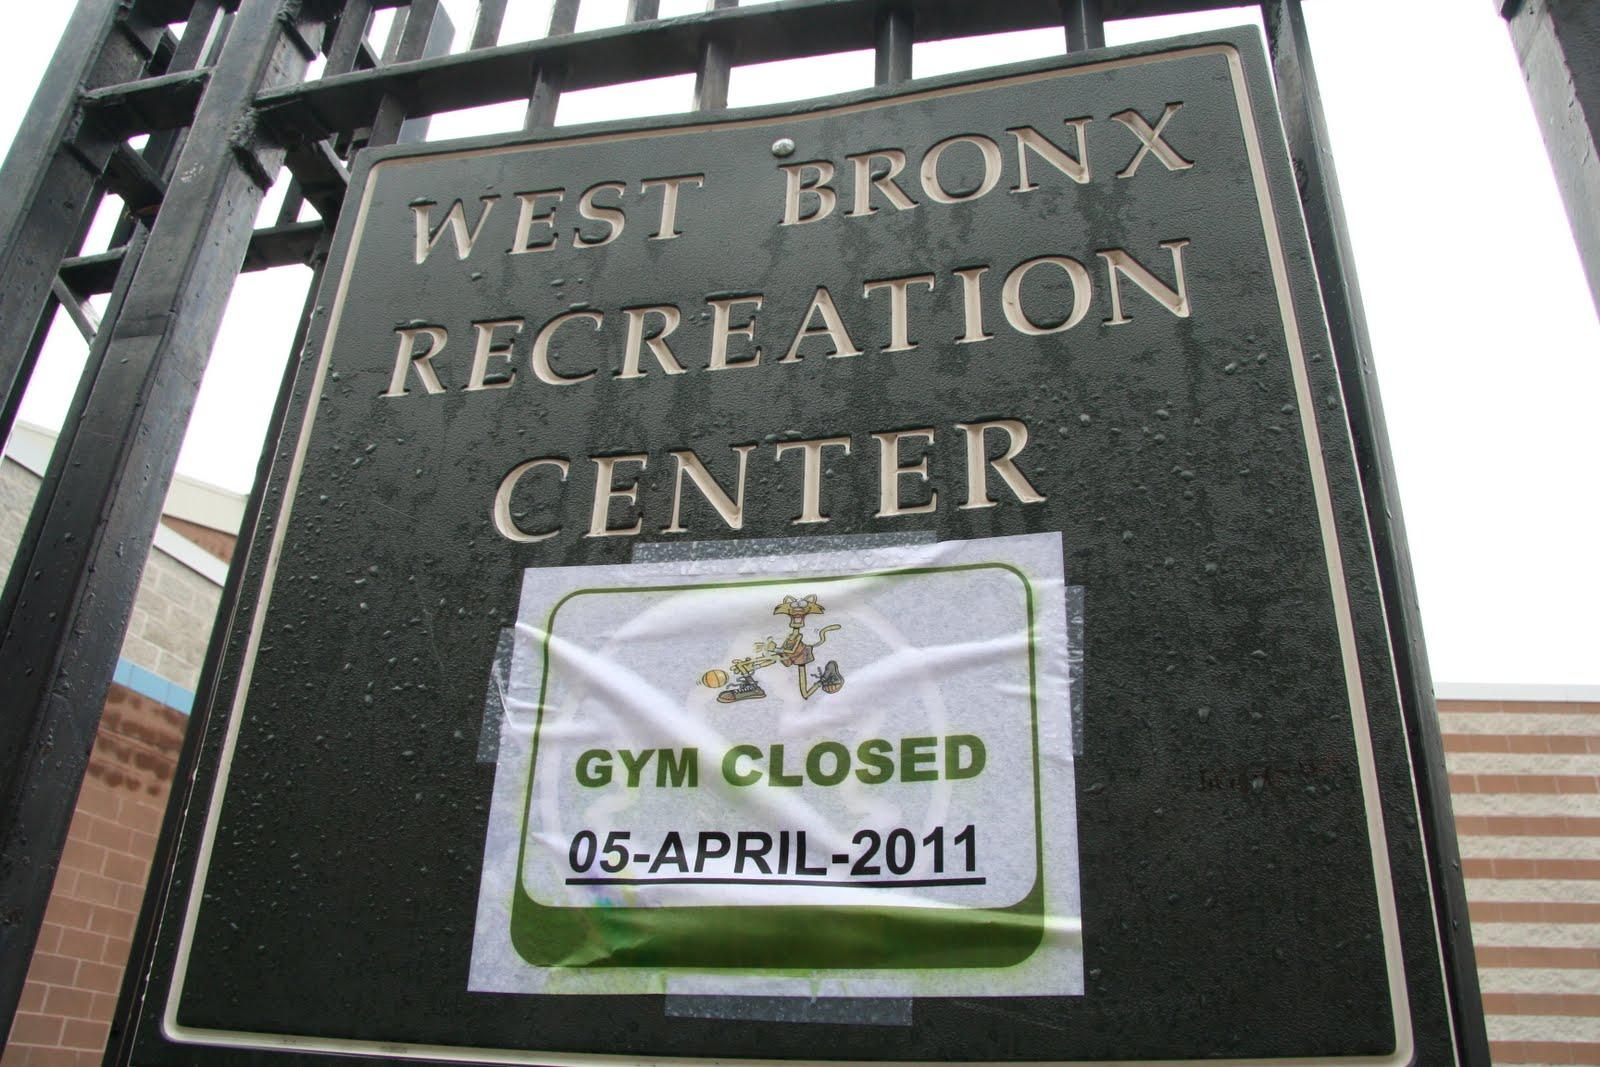 A Walk in the Park: Man Shot Dead In West Bronx Recreation